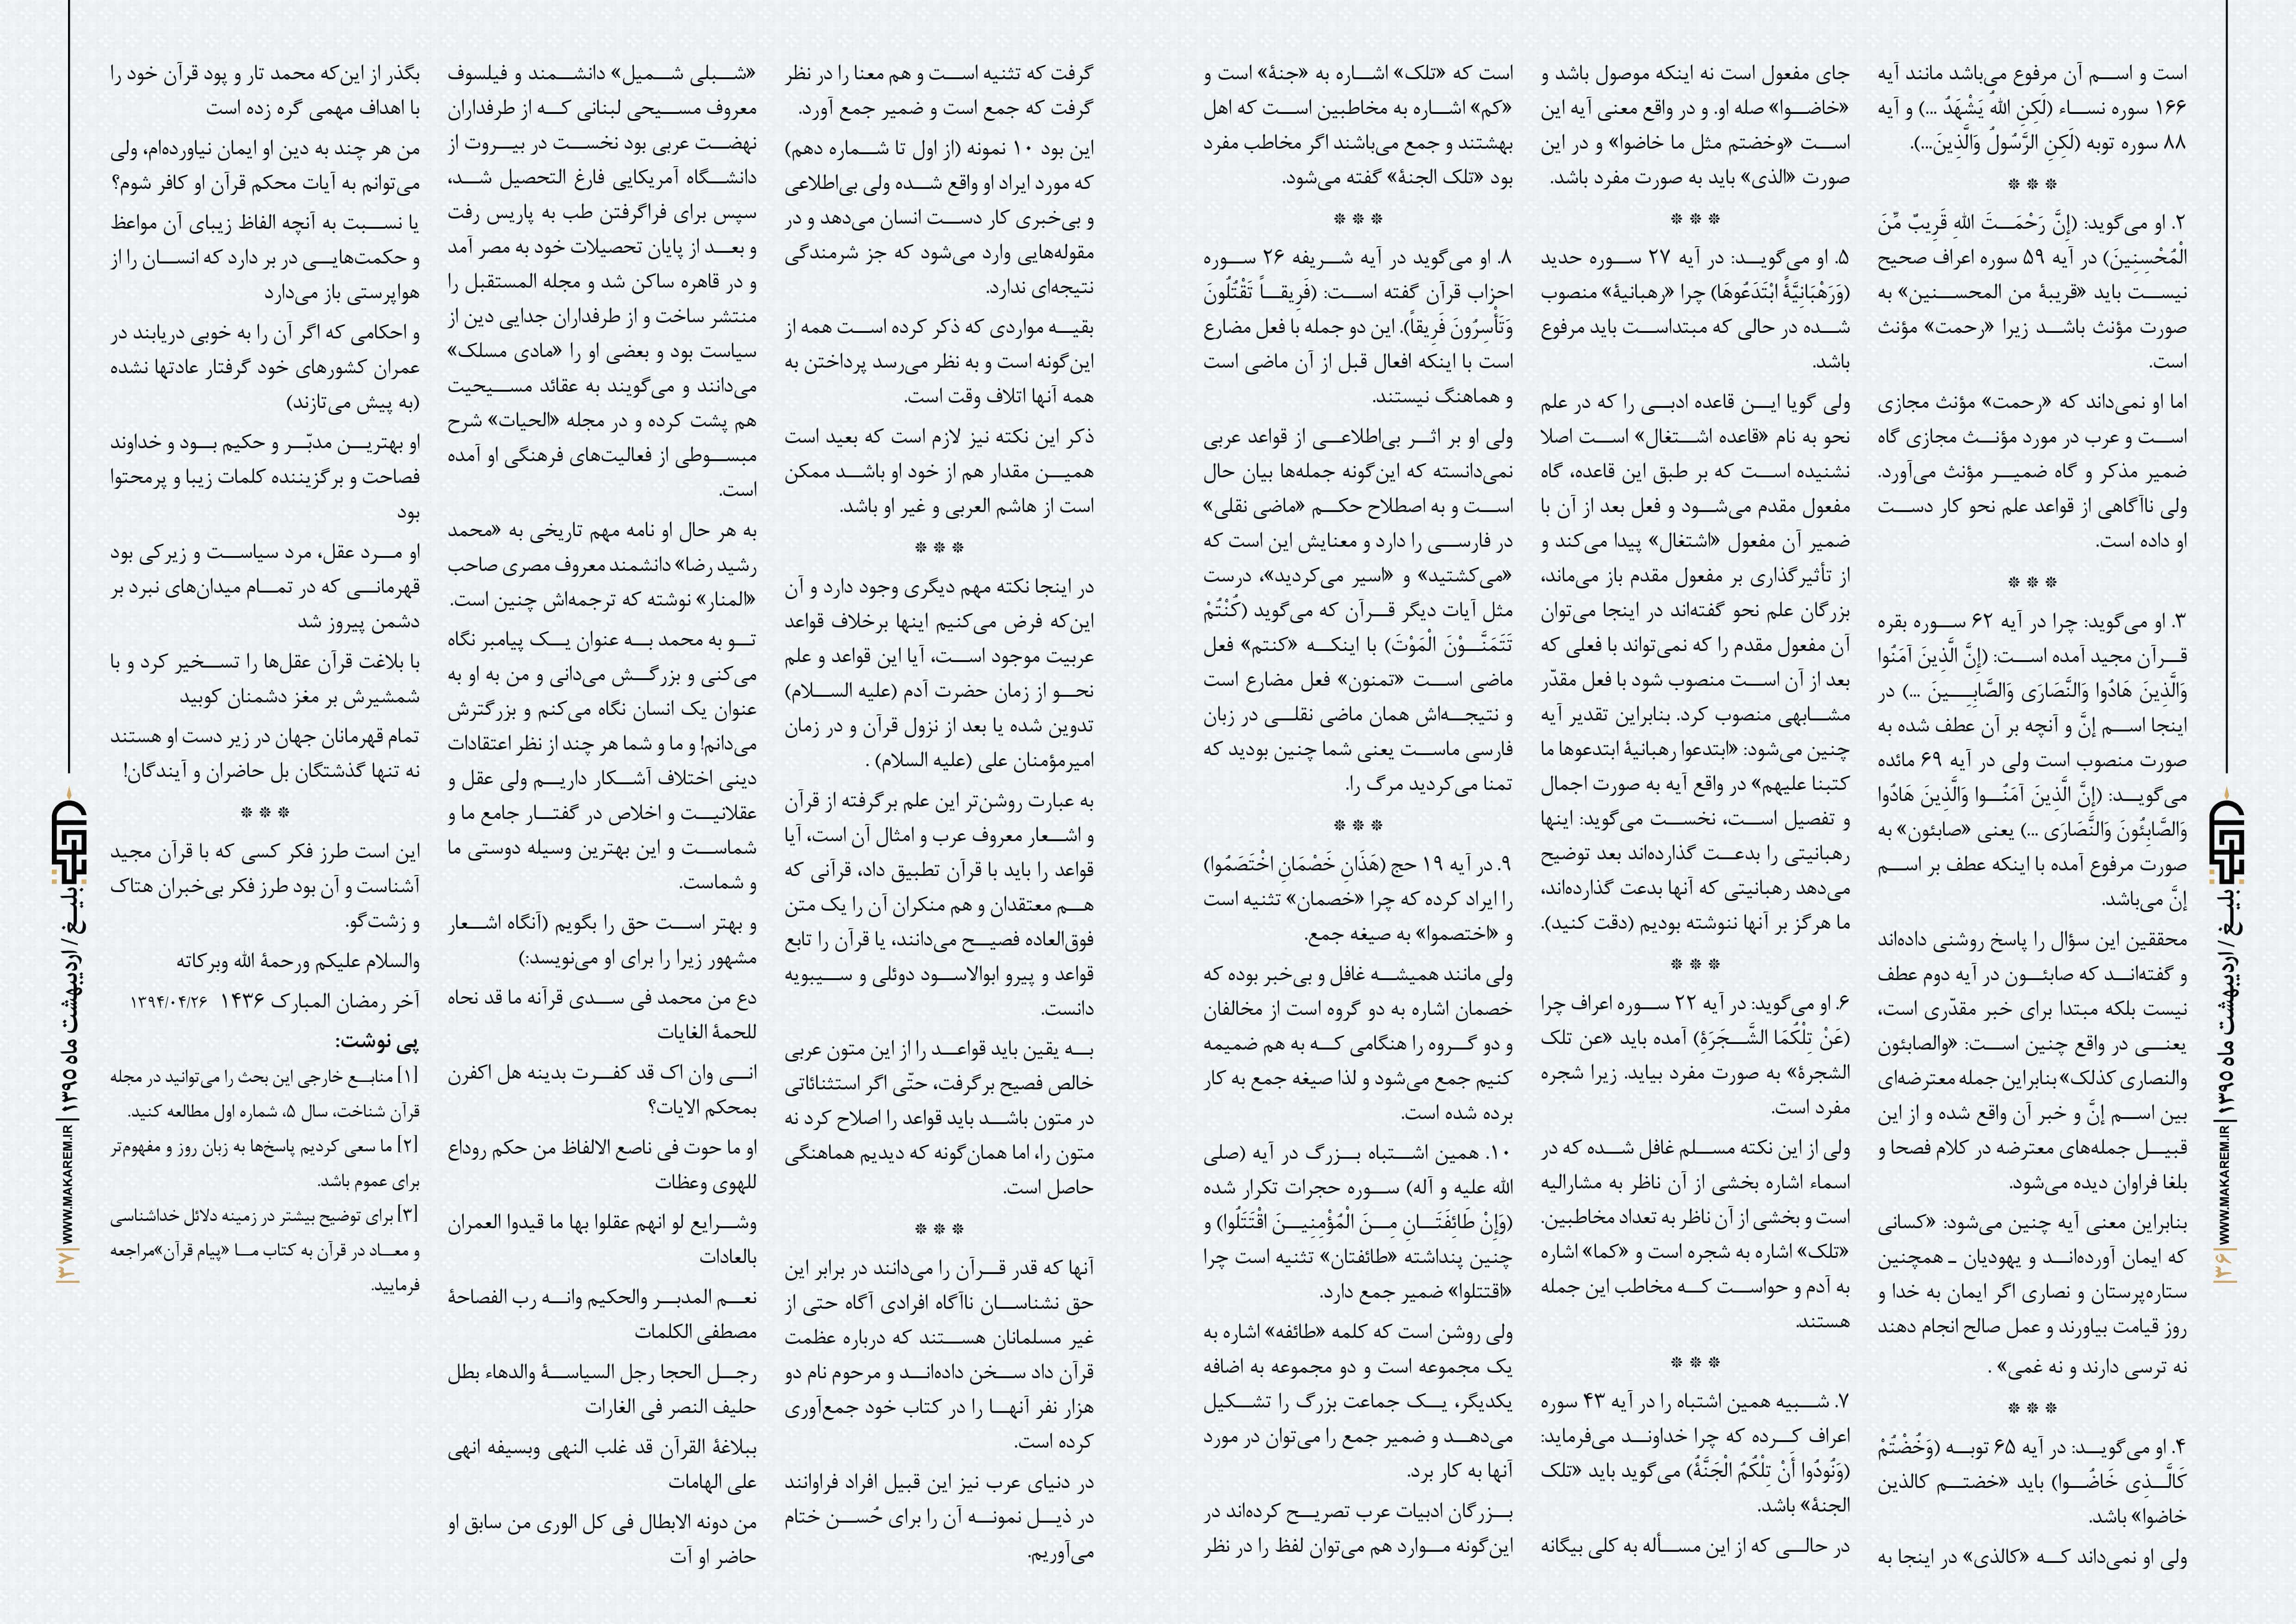 19-مدرسه الامام امیر المومنین (ع)